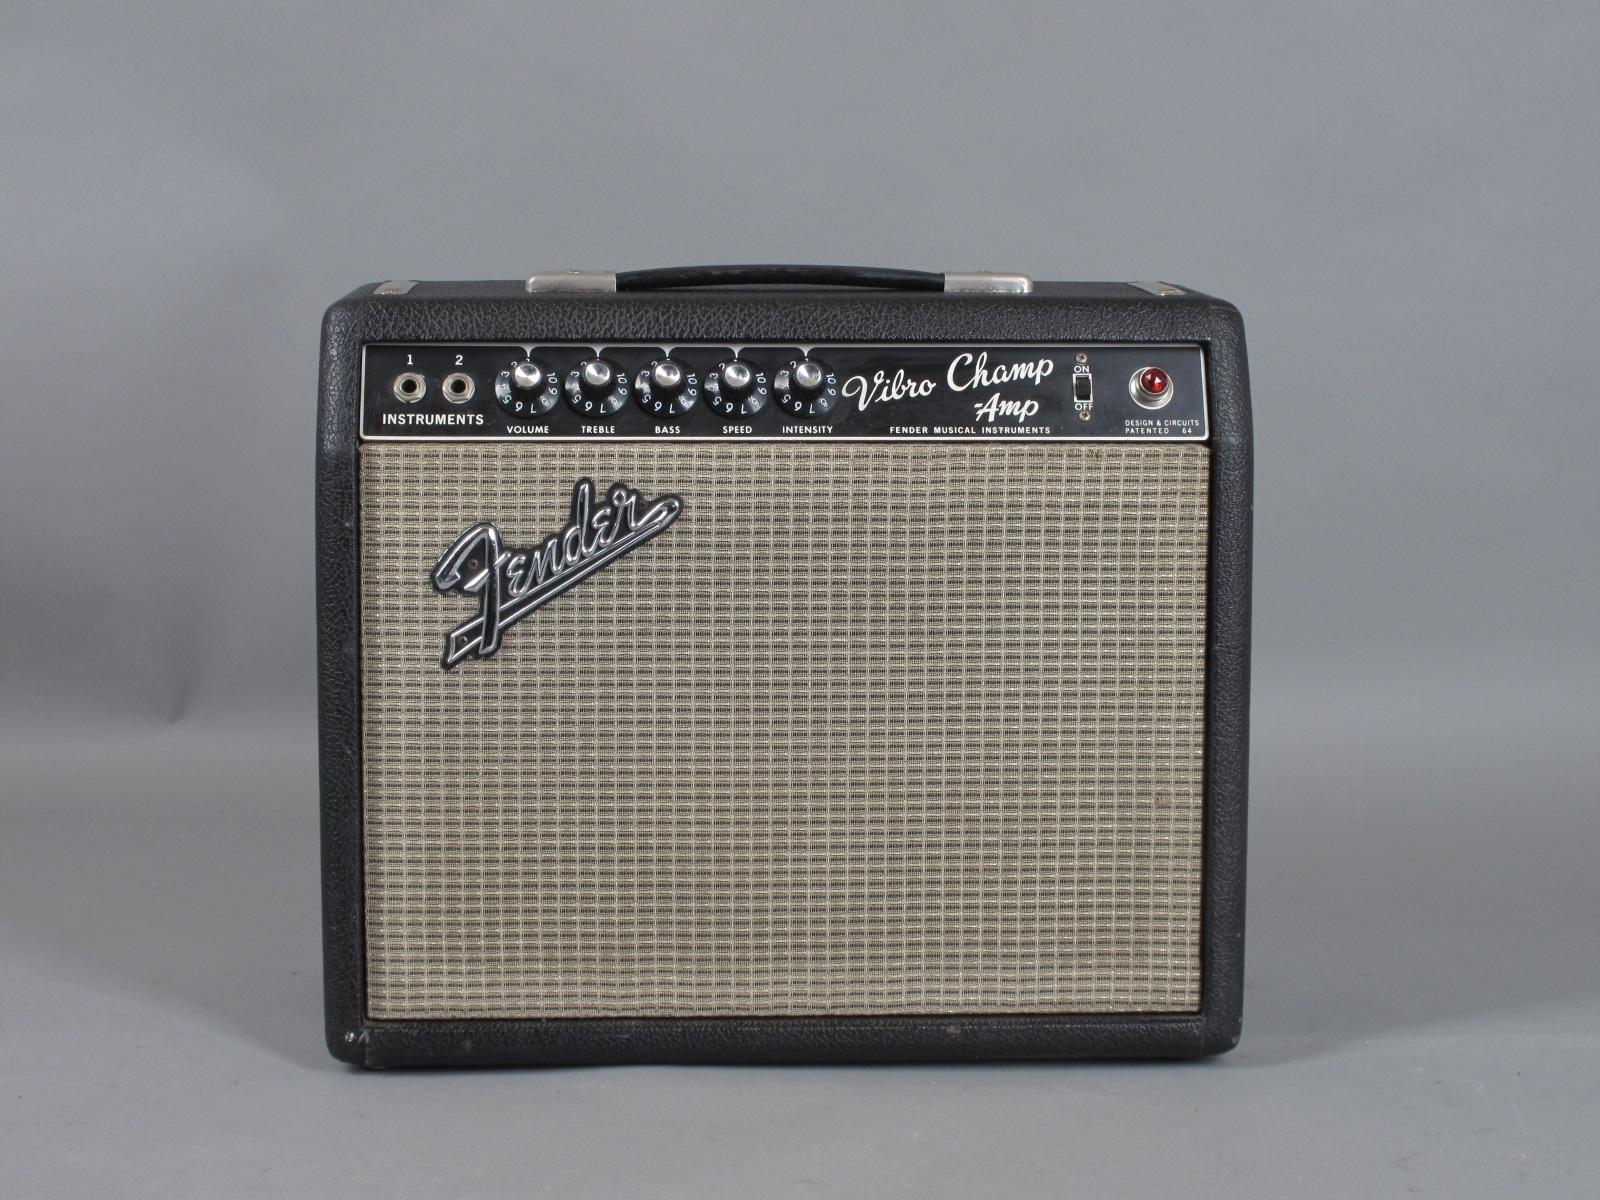 1967 Fender Vibro Champ Amp - Blackface